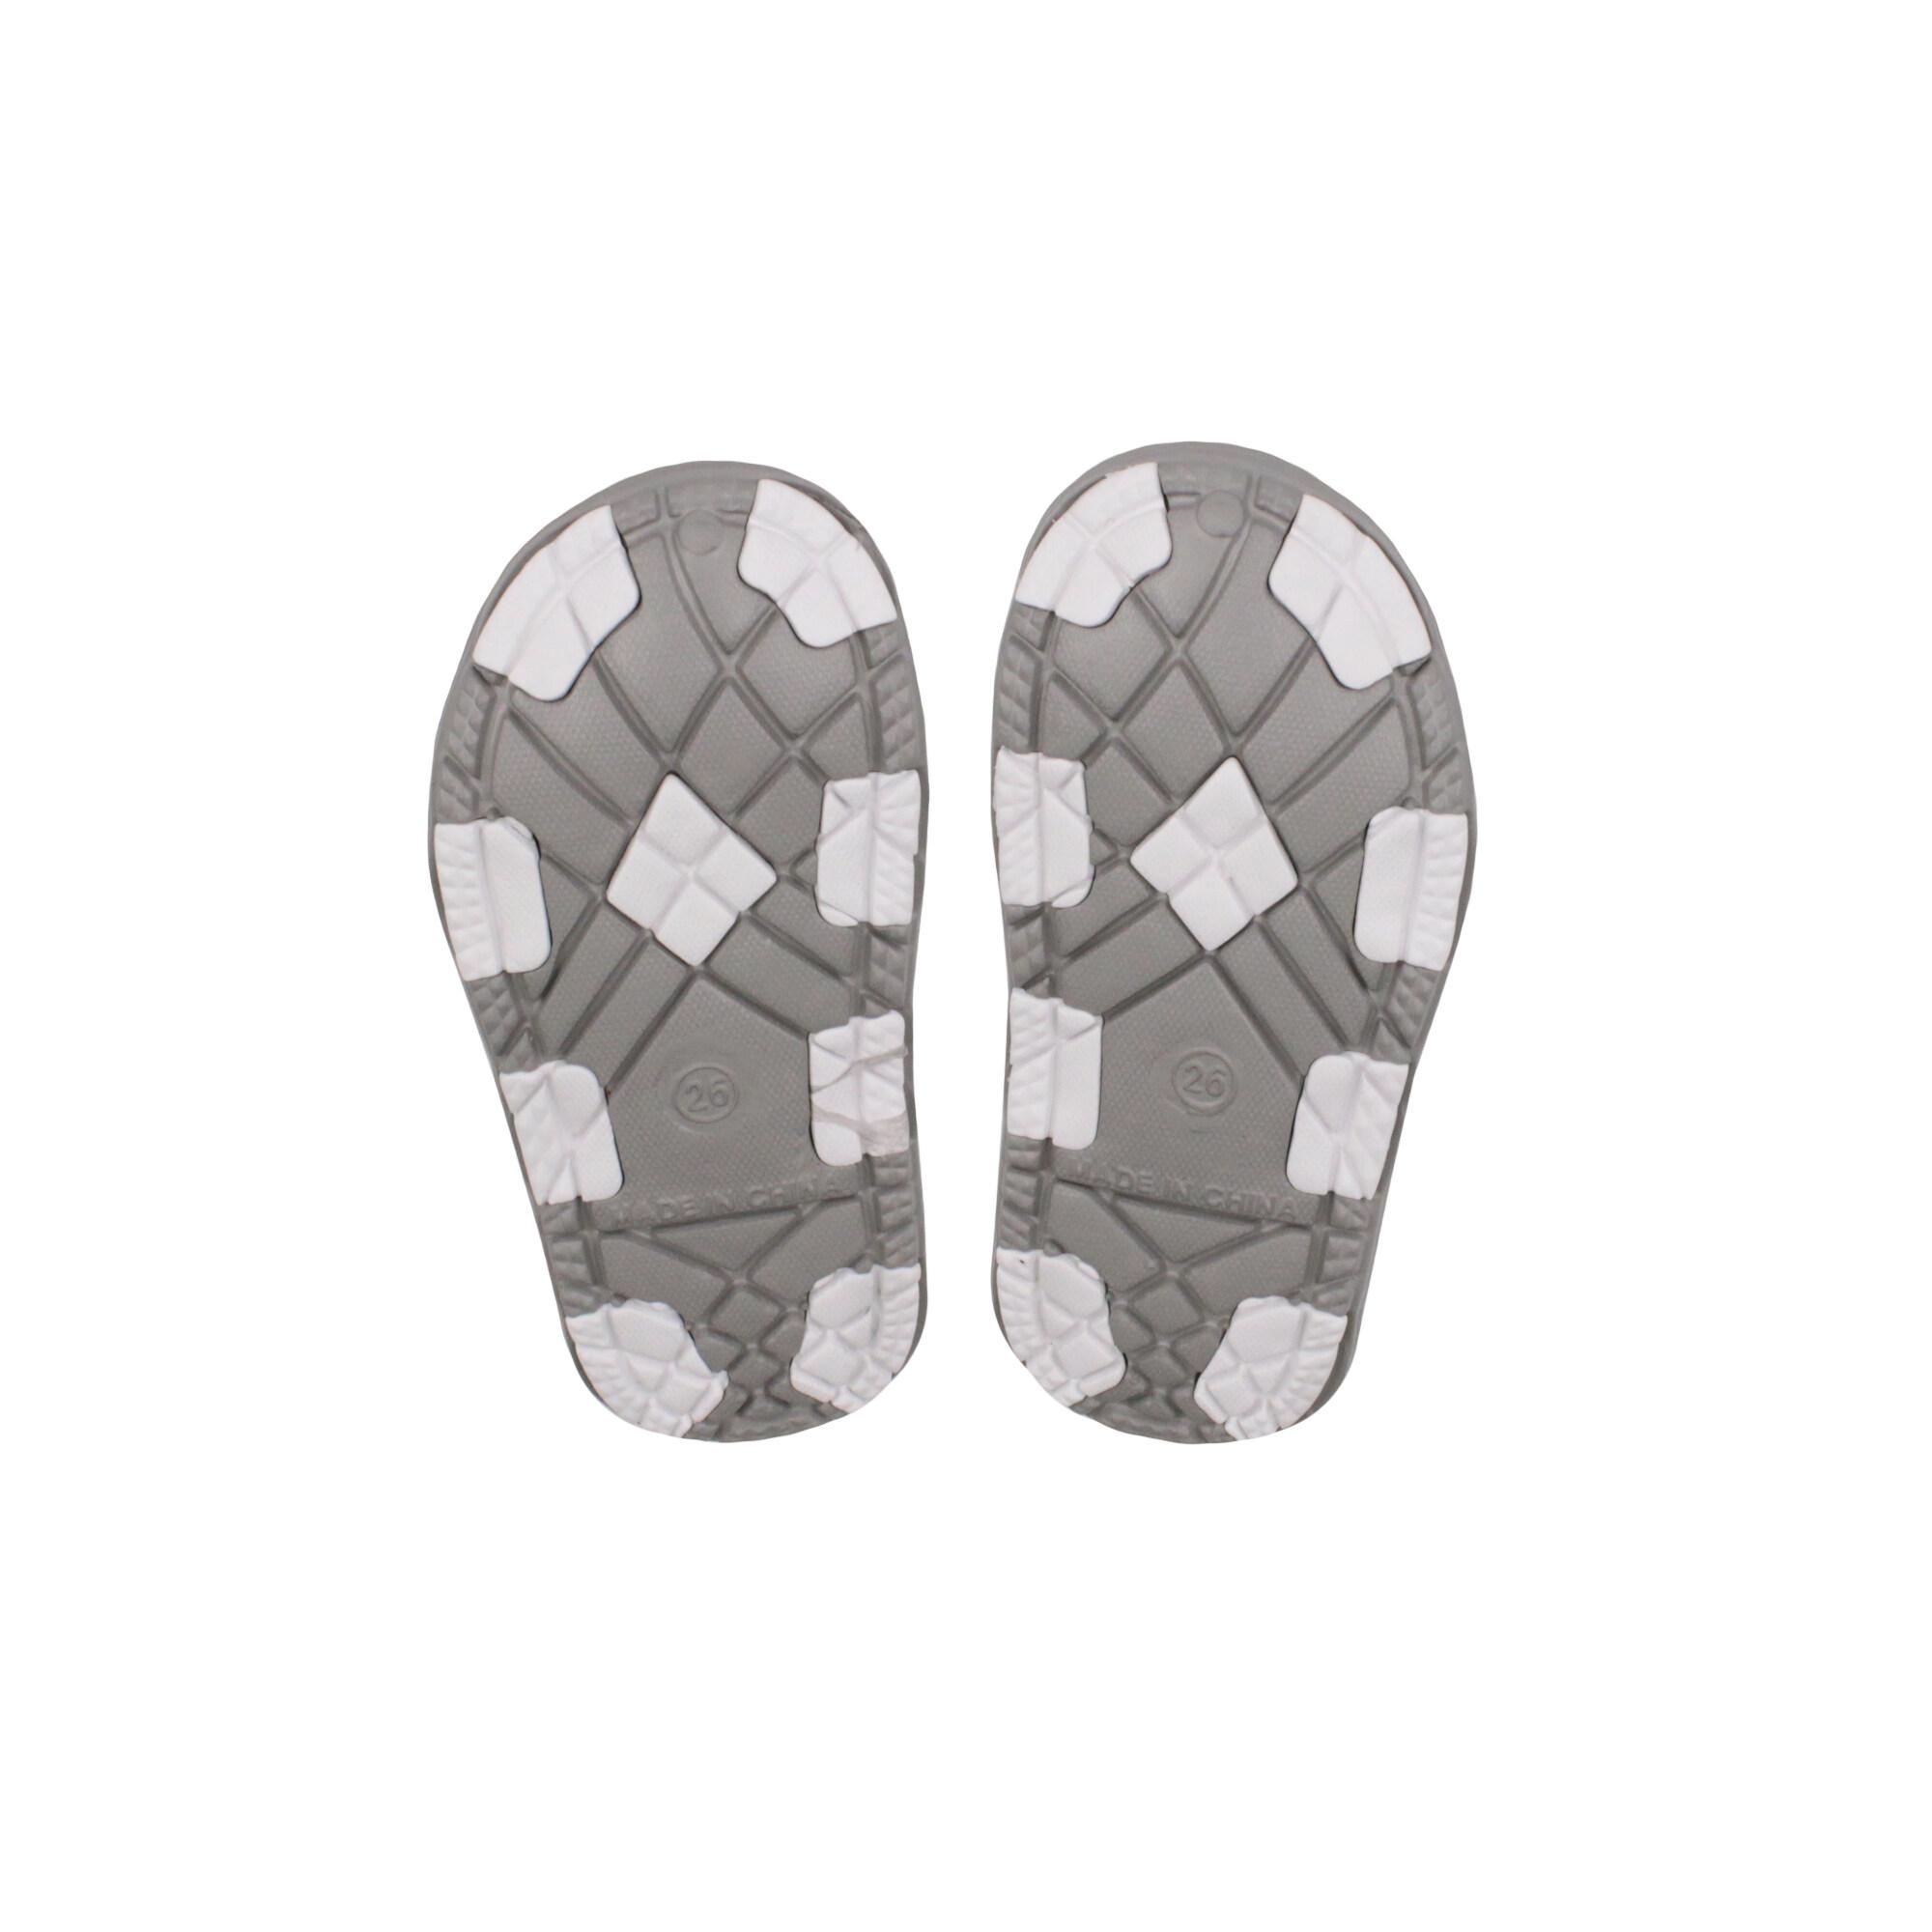 We Bare Bears Kids Unisex Sandals- Grey & White Colour